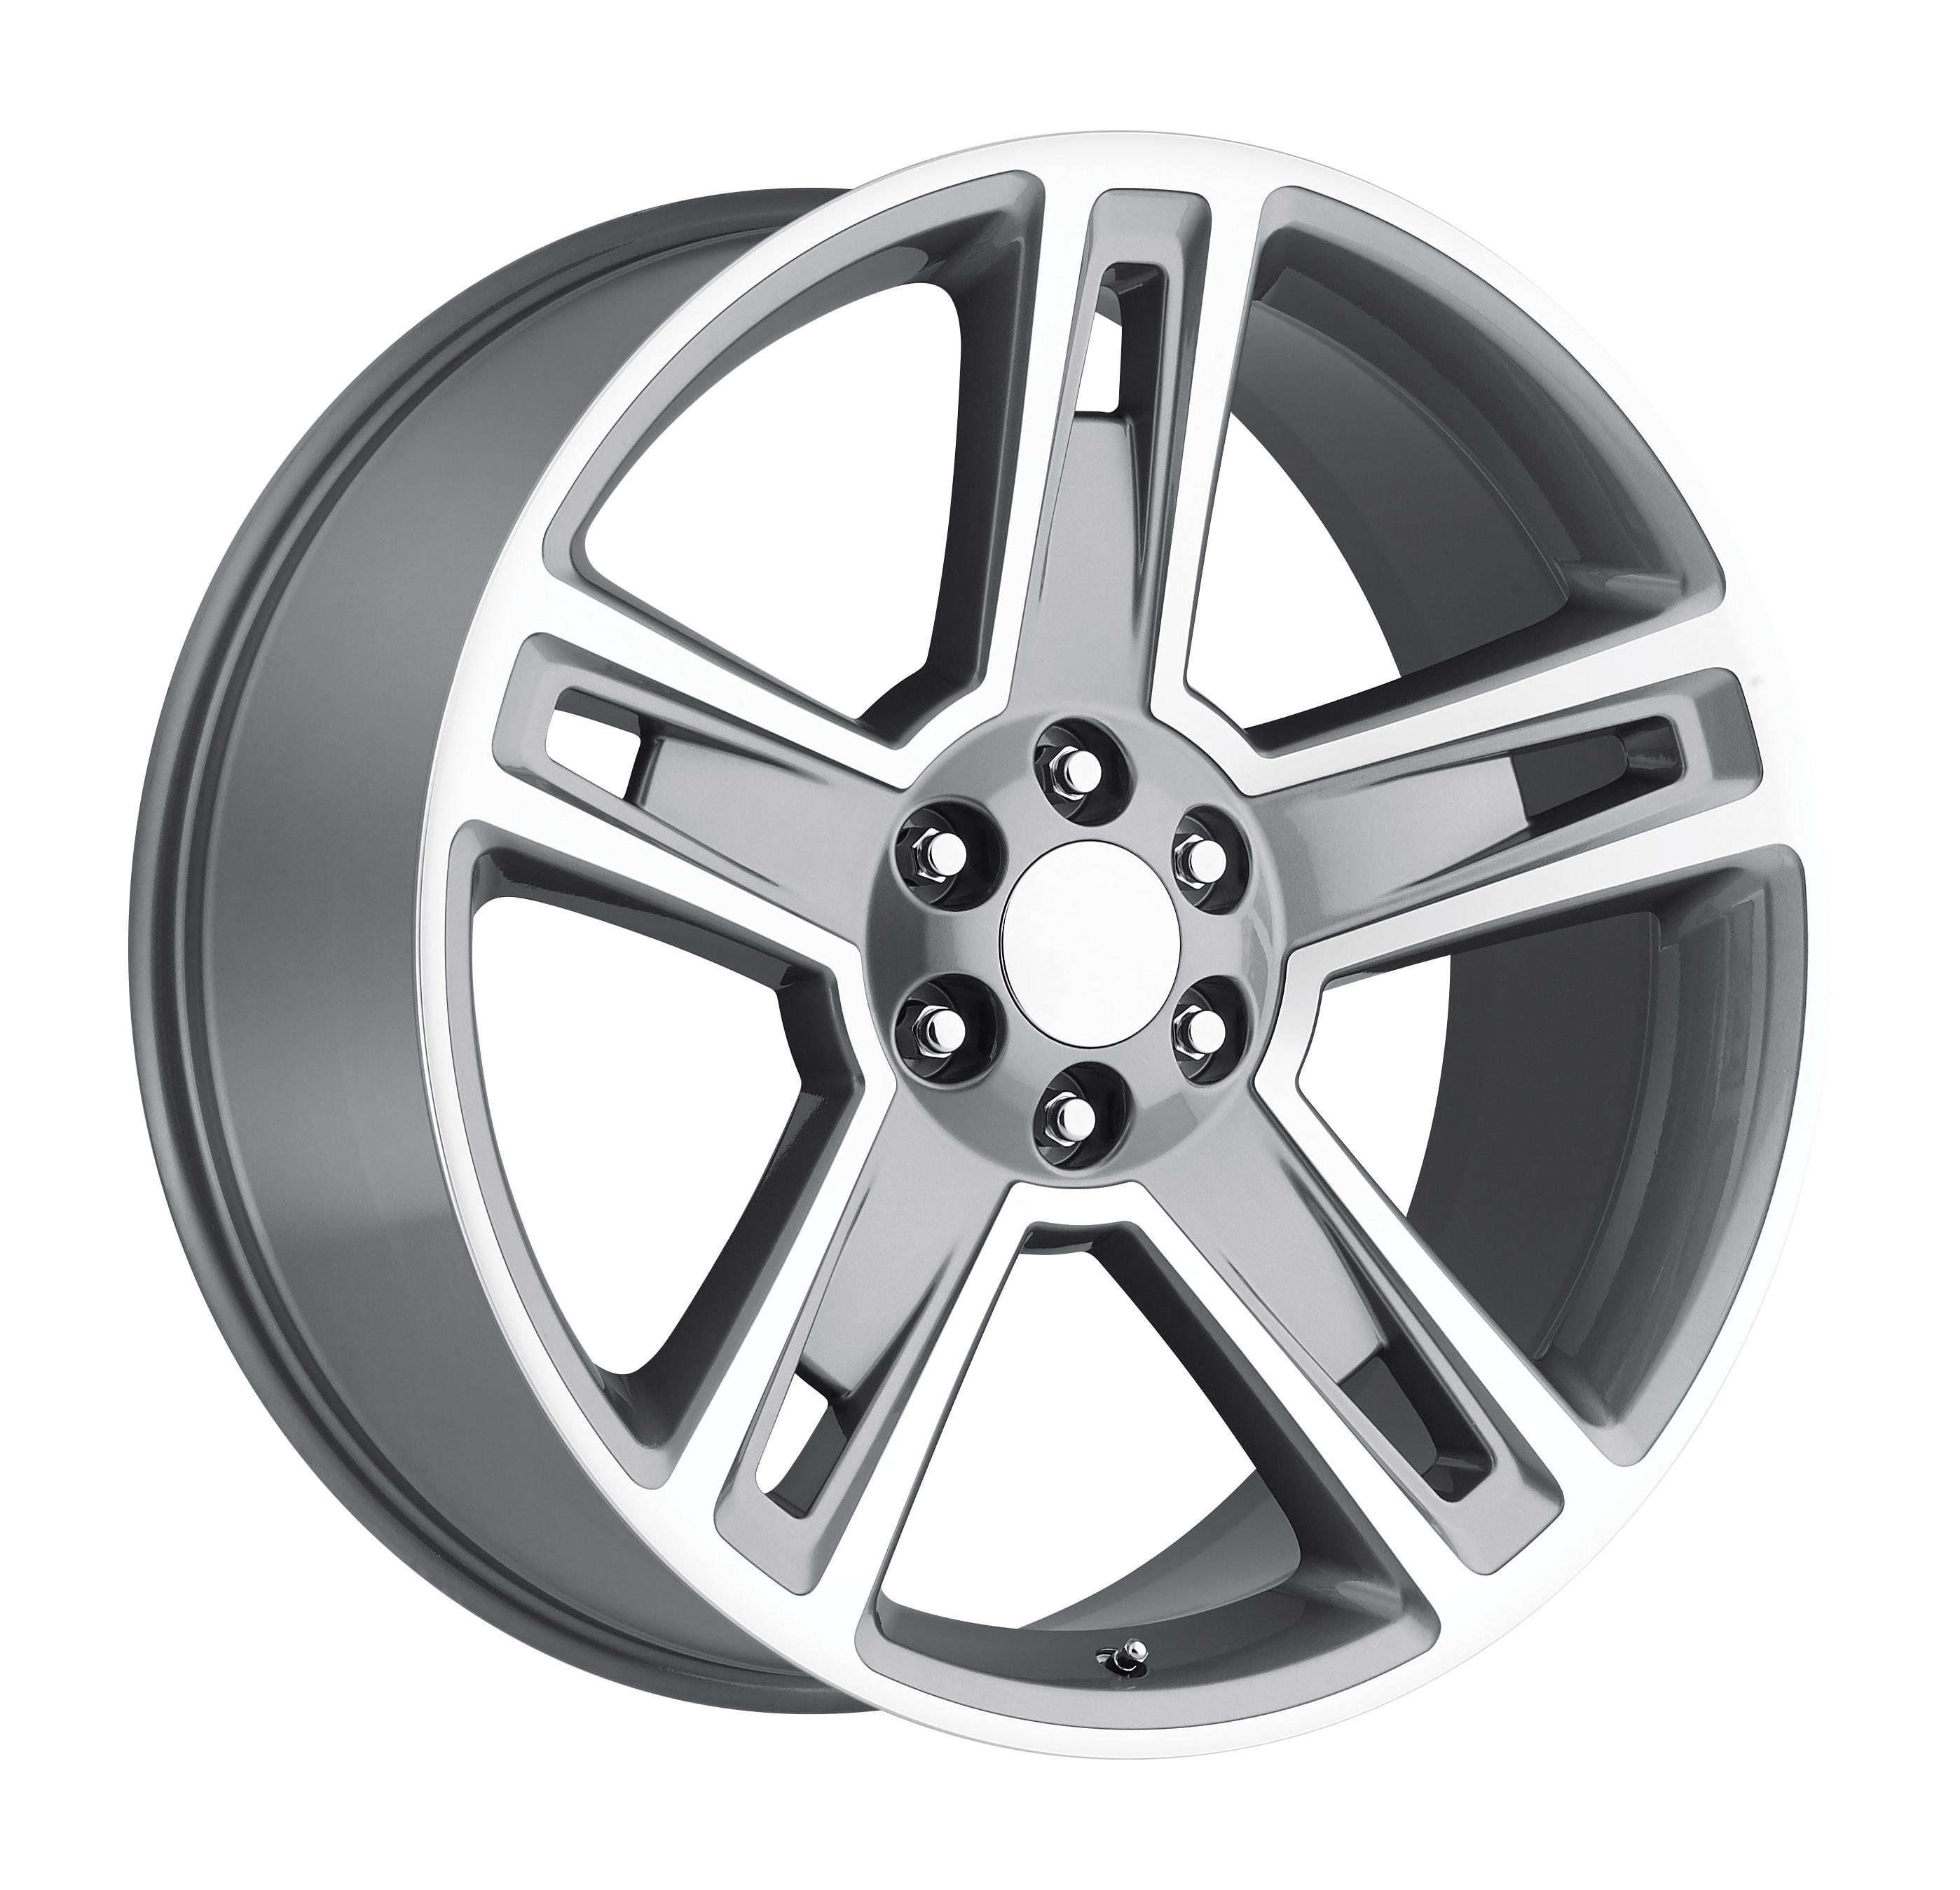 2015 Chevrolet Silverado 1500 Grey Machined Face Replicas